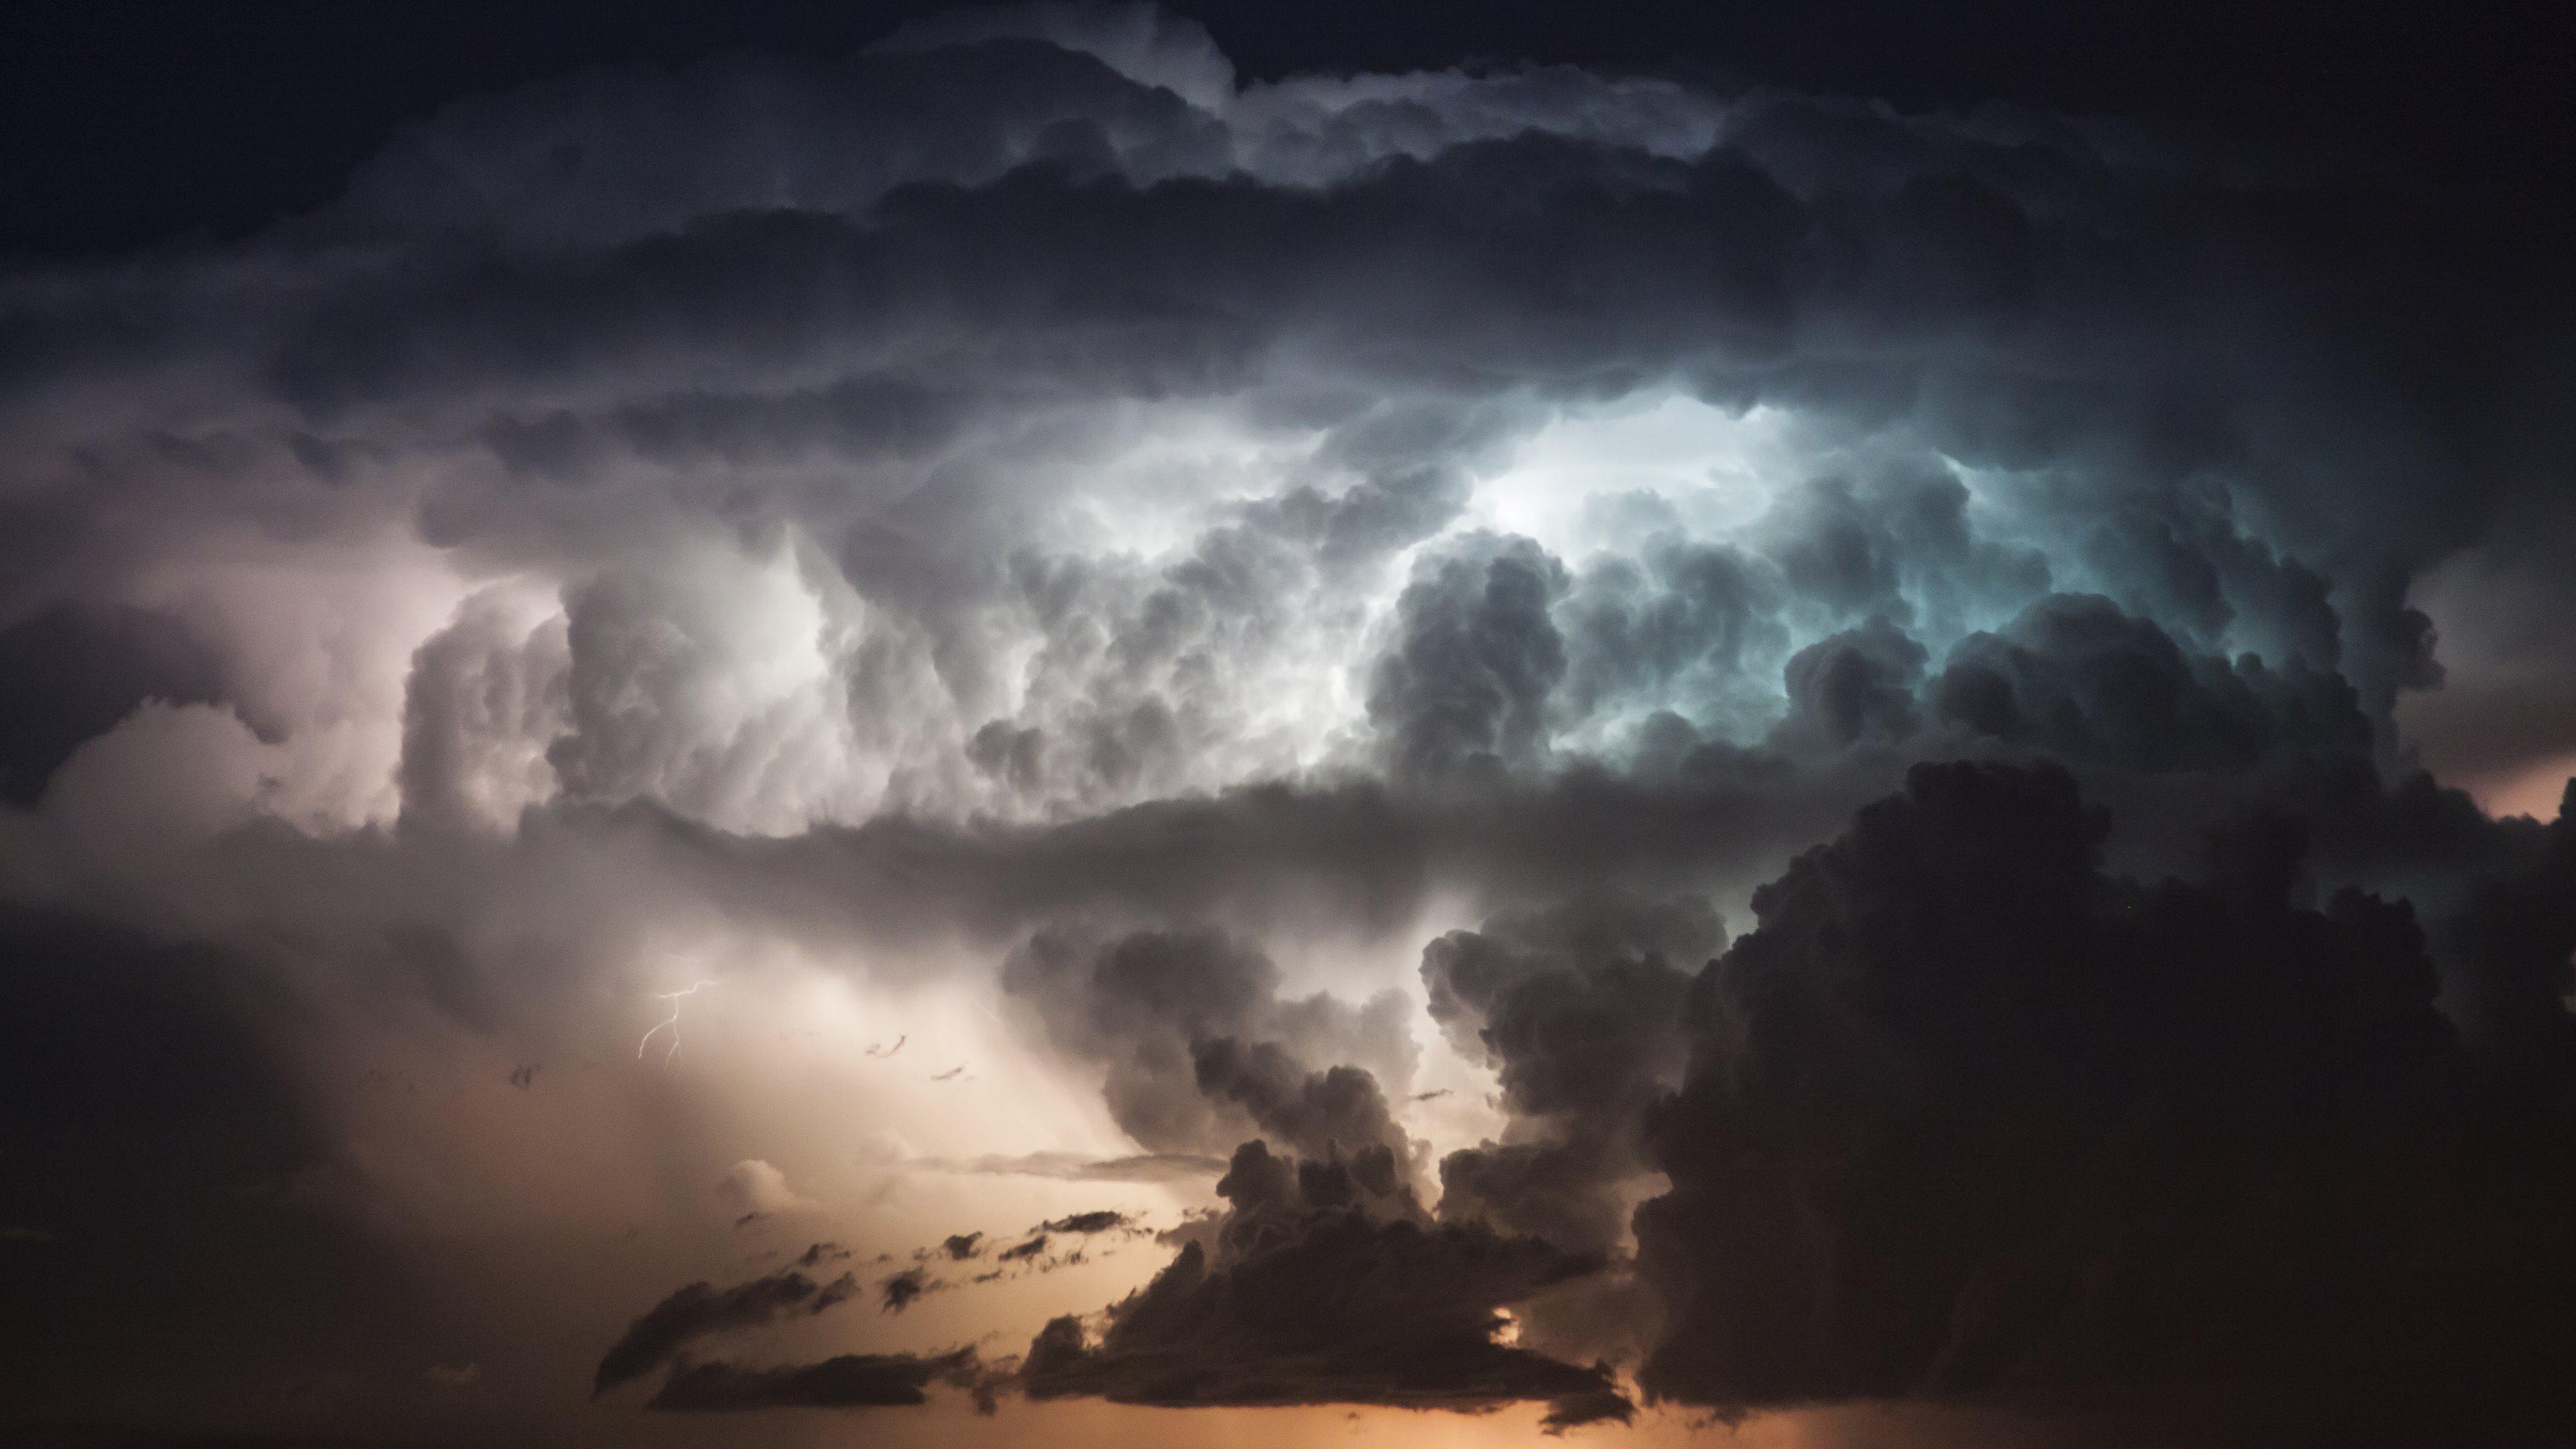 thunderhead clouds wallpaper - photo #29